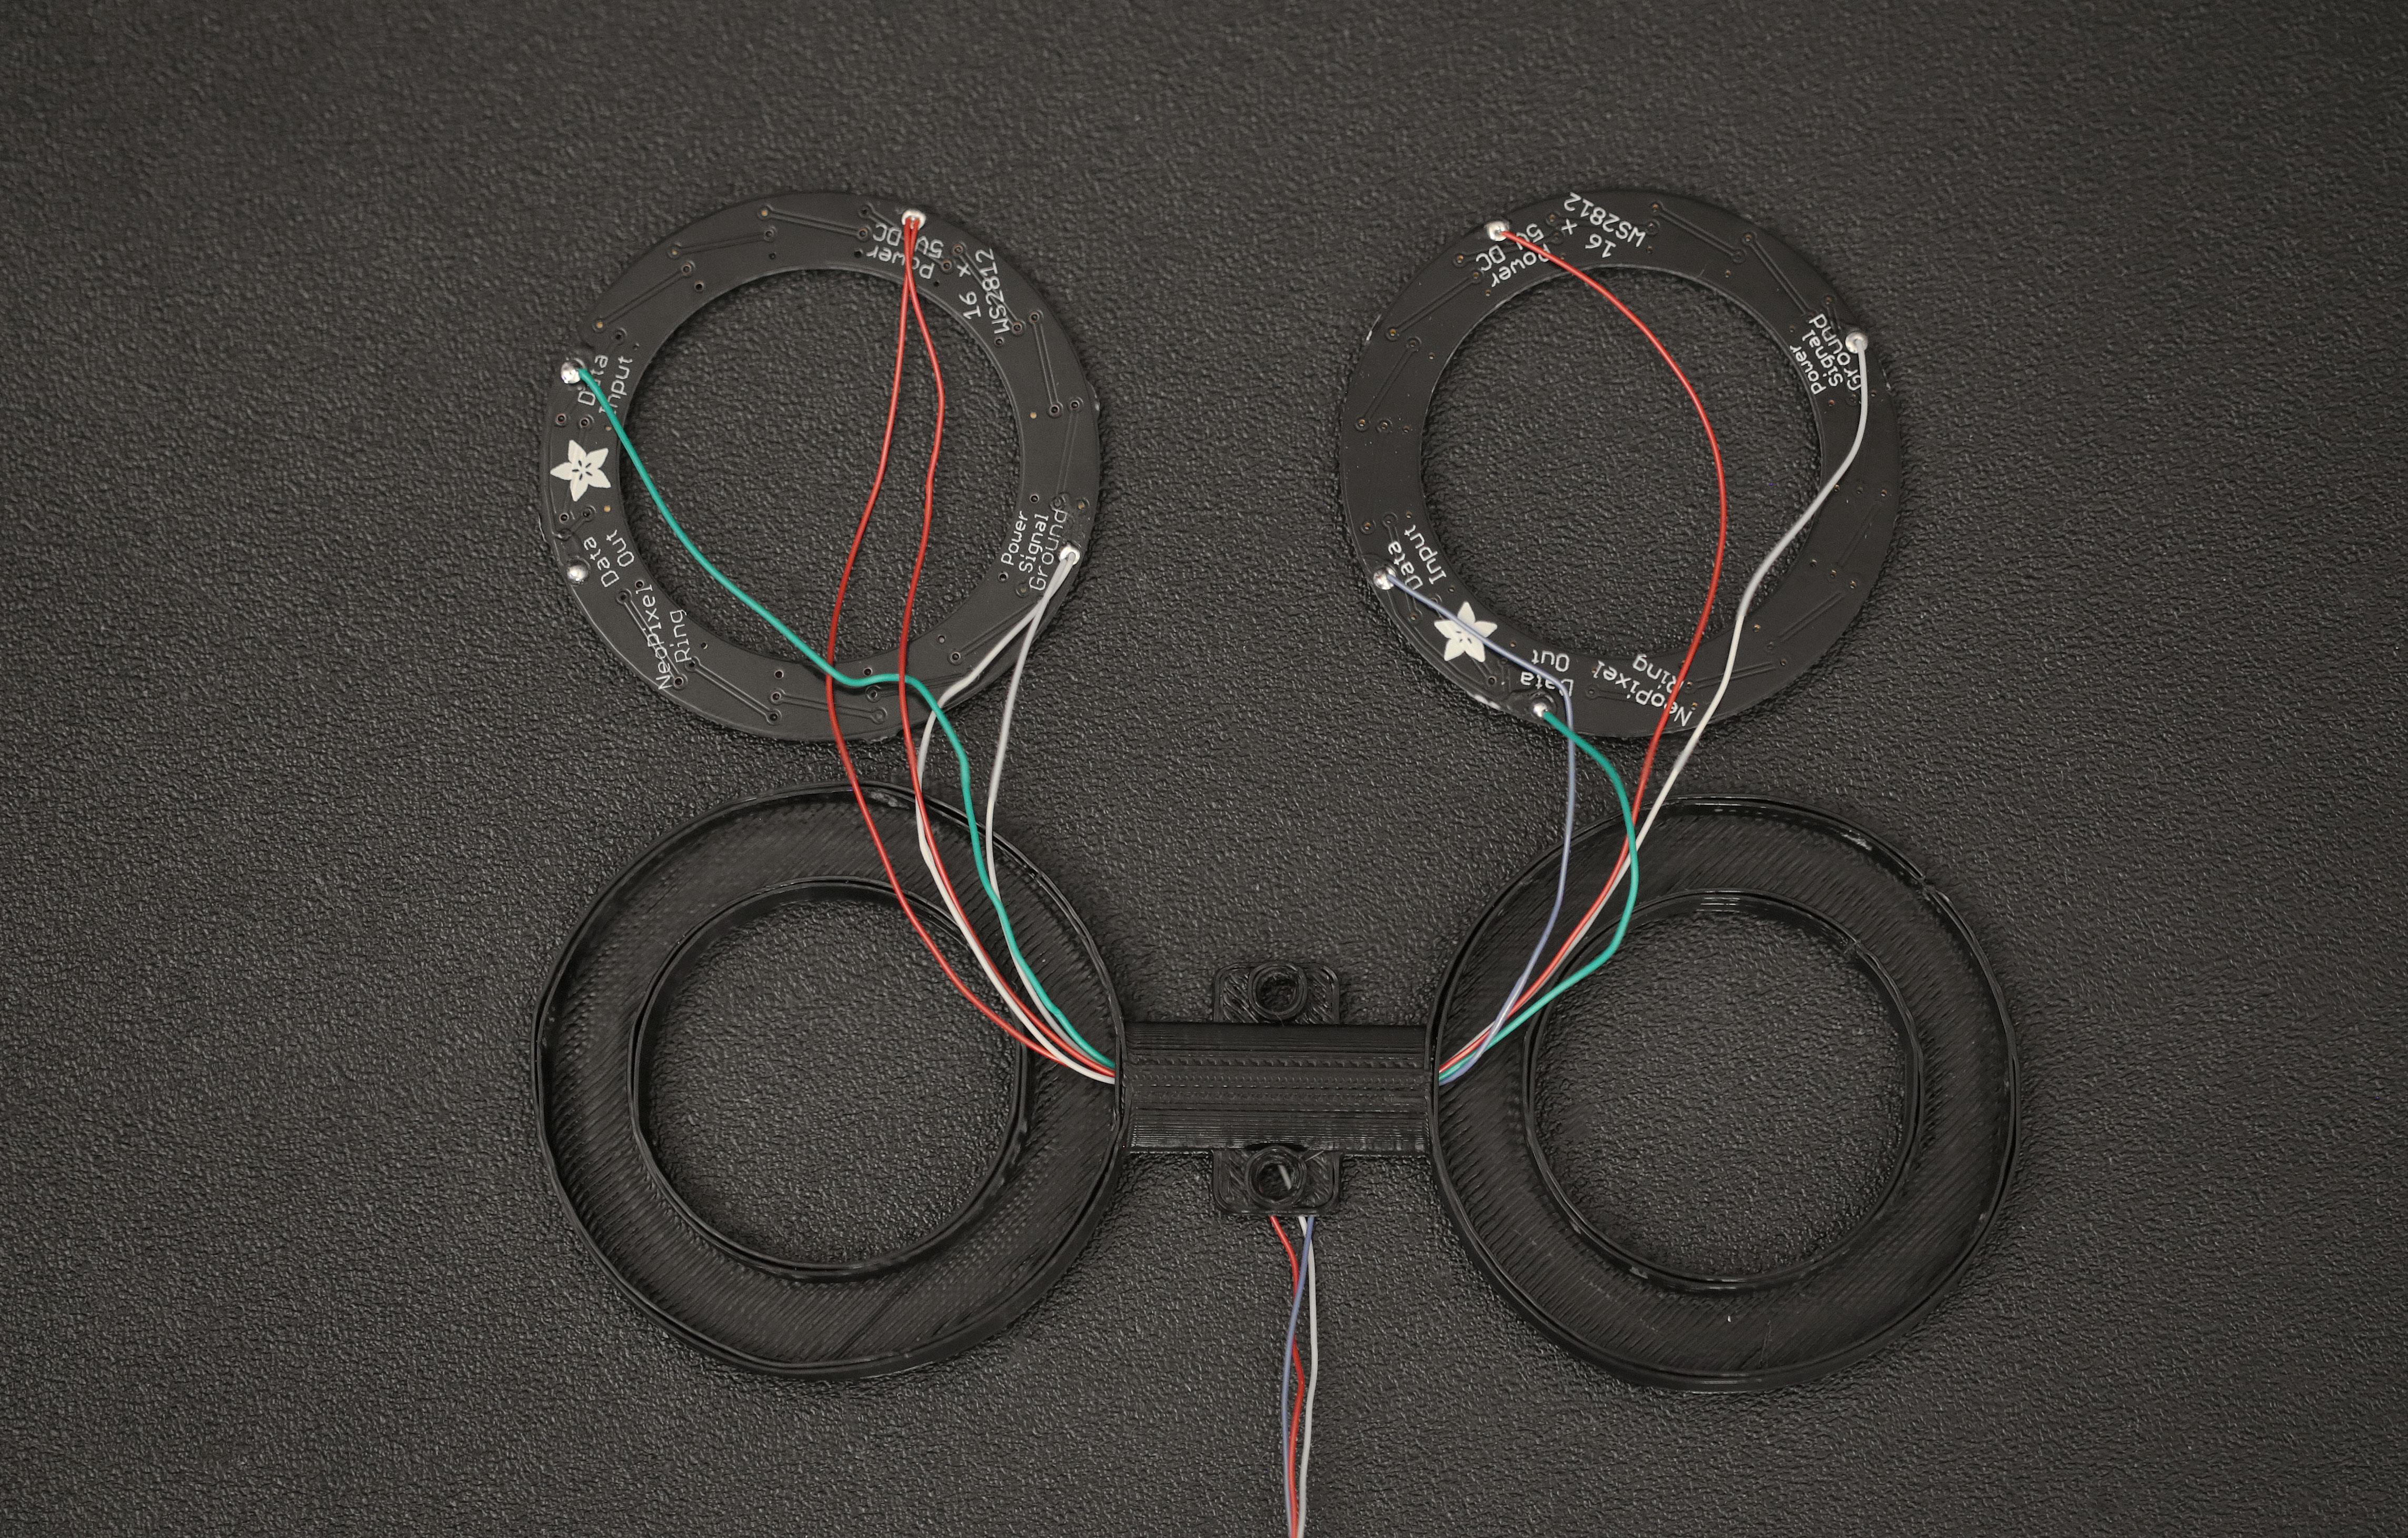 leds_rings-wires.jpg